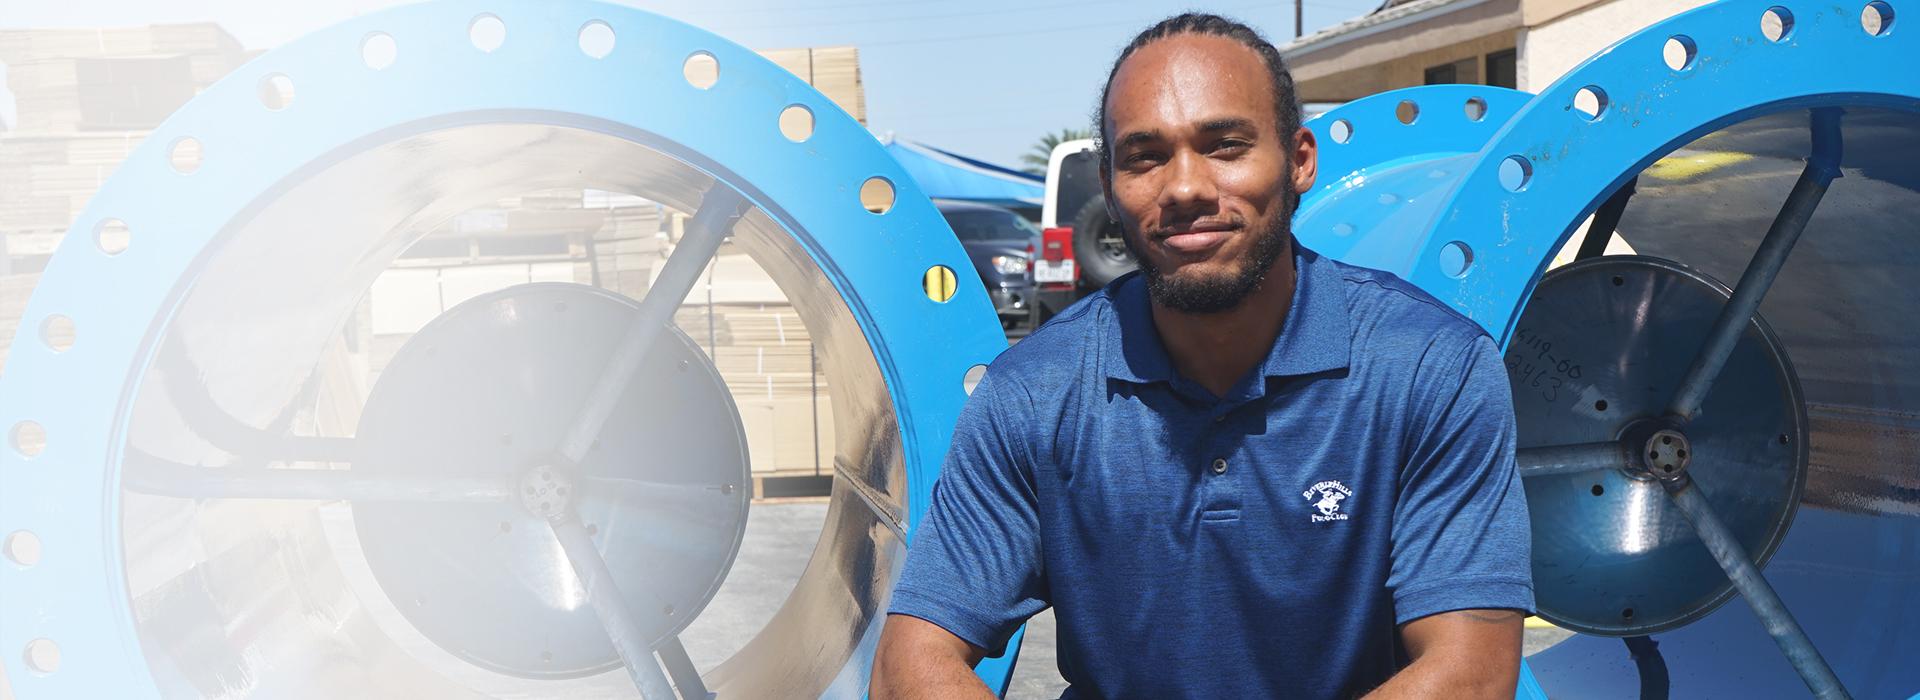 Photograph of McCrometer associate in equipment yard